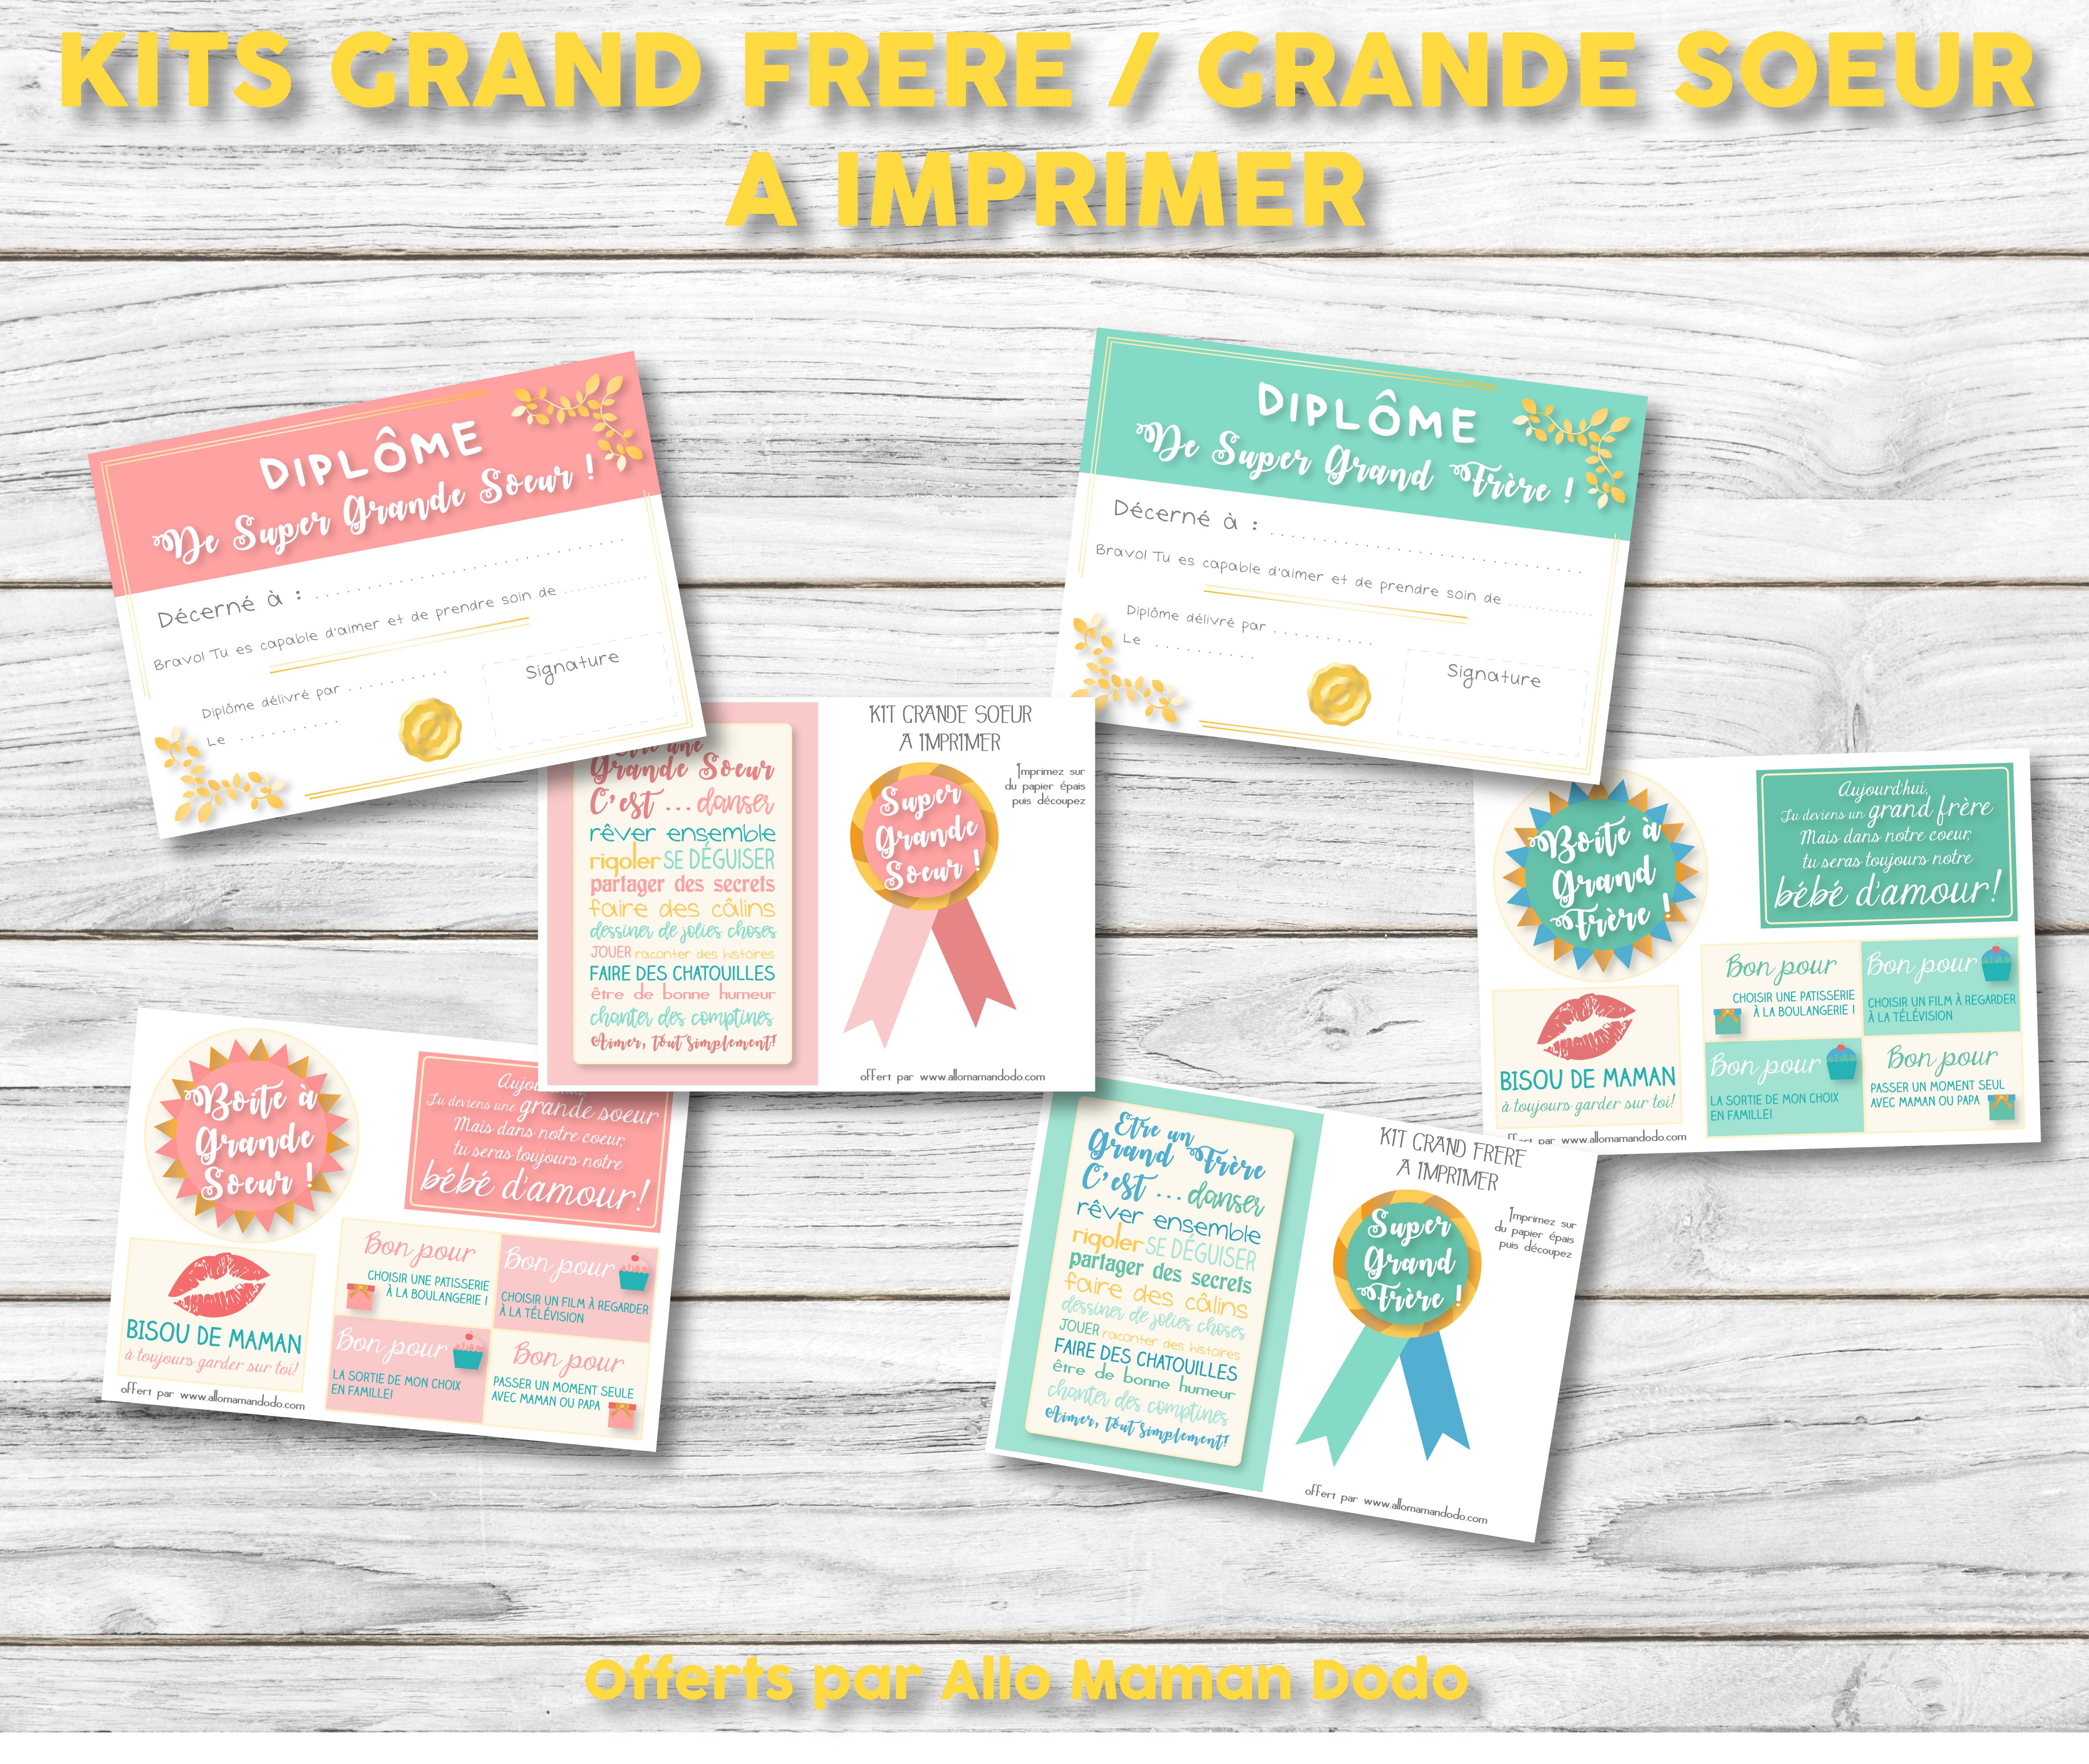 Kit A Imprimer Grande Soeur Grand Frere Diplome